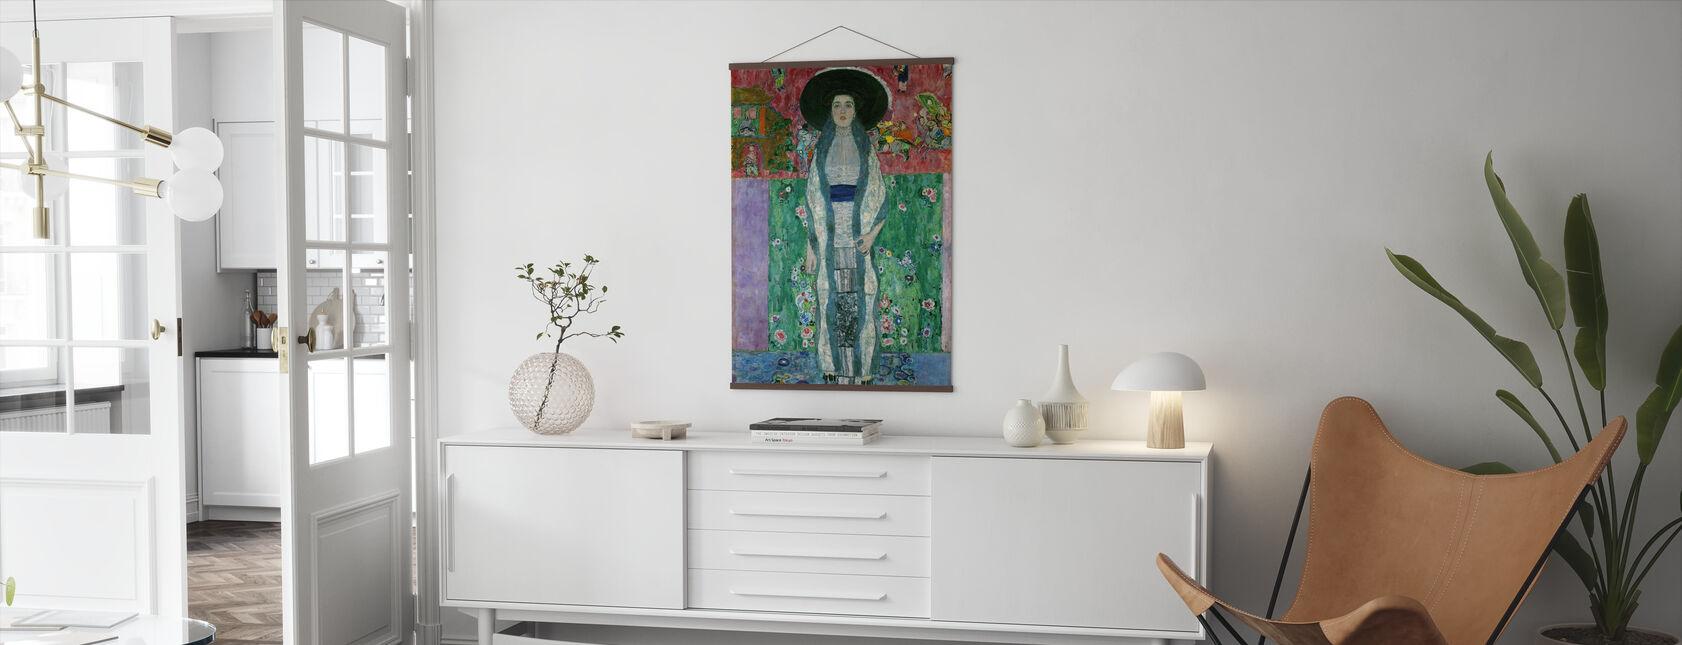 Muotokuva Adele Bloch-Bauer - Gustav Klimt - Juliste - Olohuone